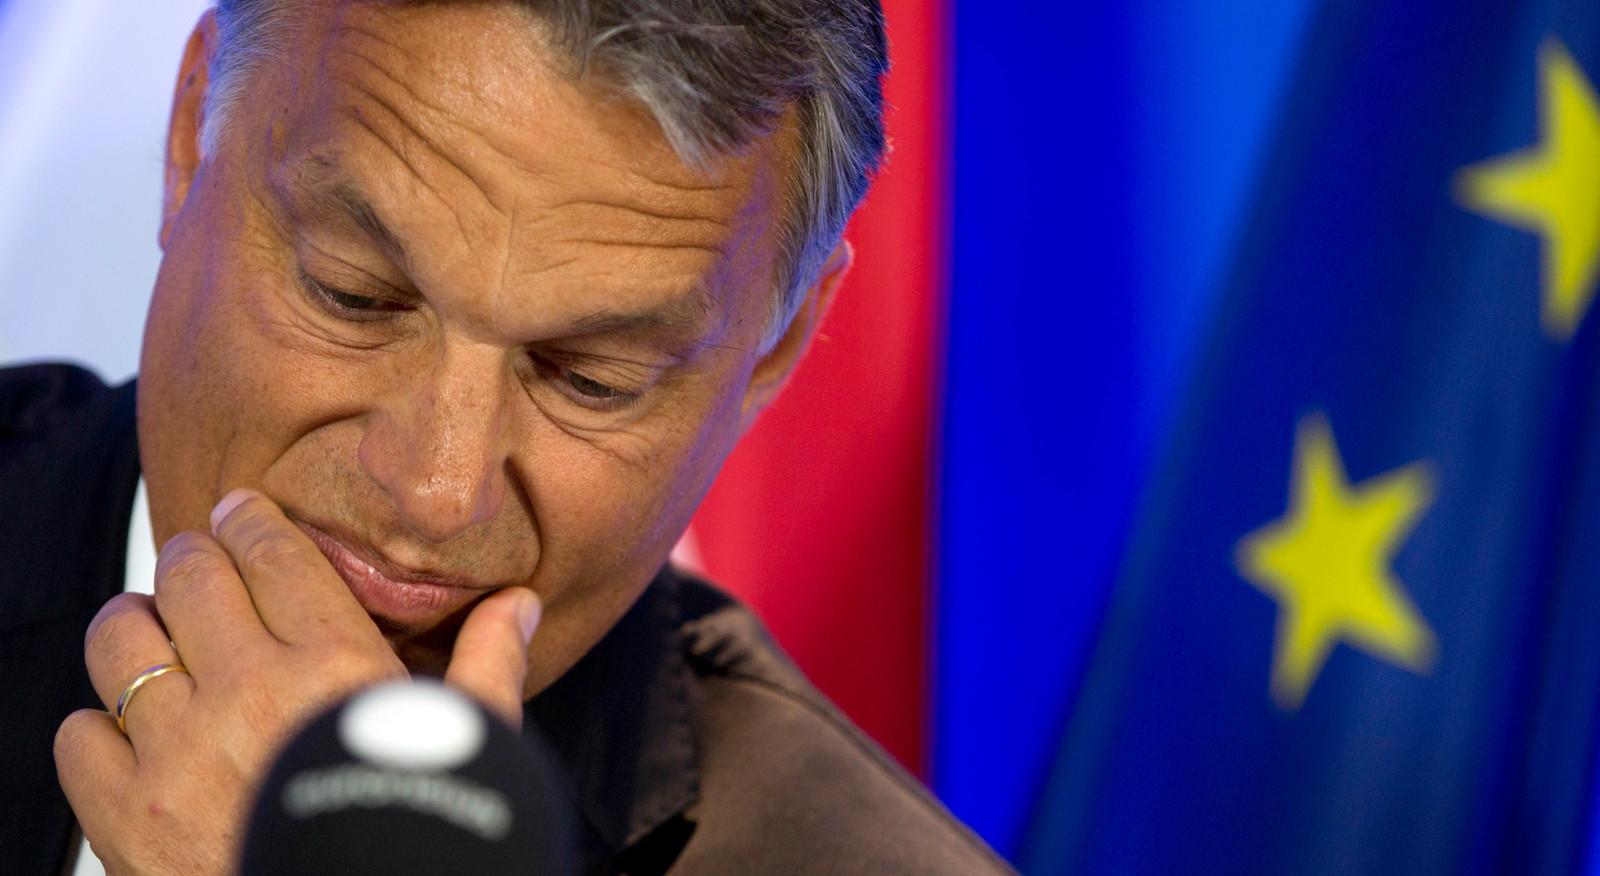 De Hongaarse premier Viktor Orbán.